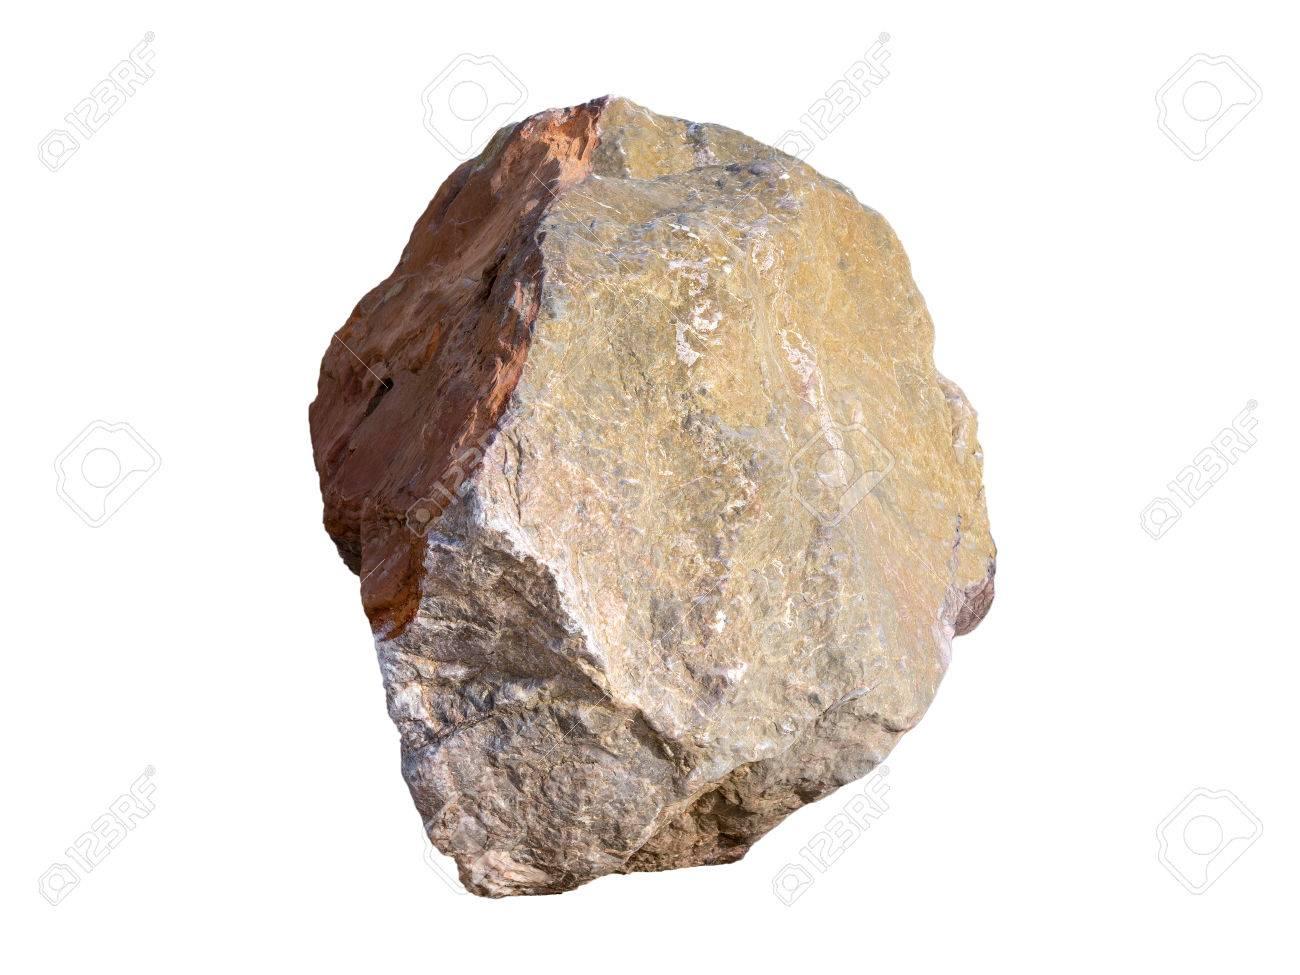 Big Granite Rock Stone Isolated On White Background